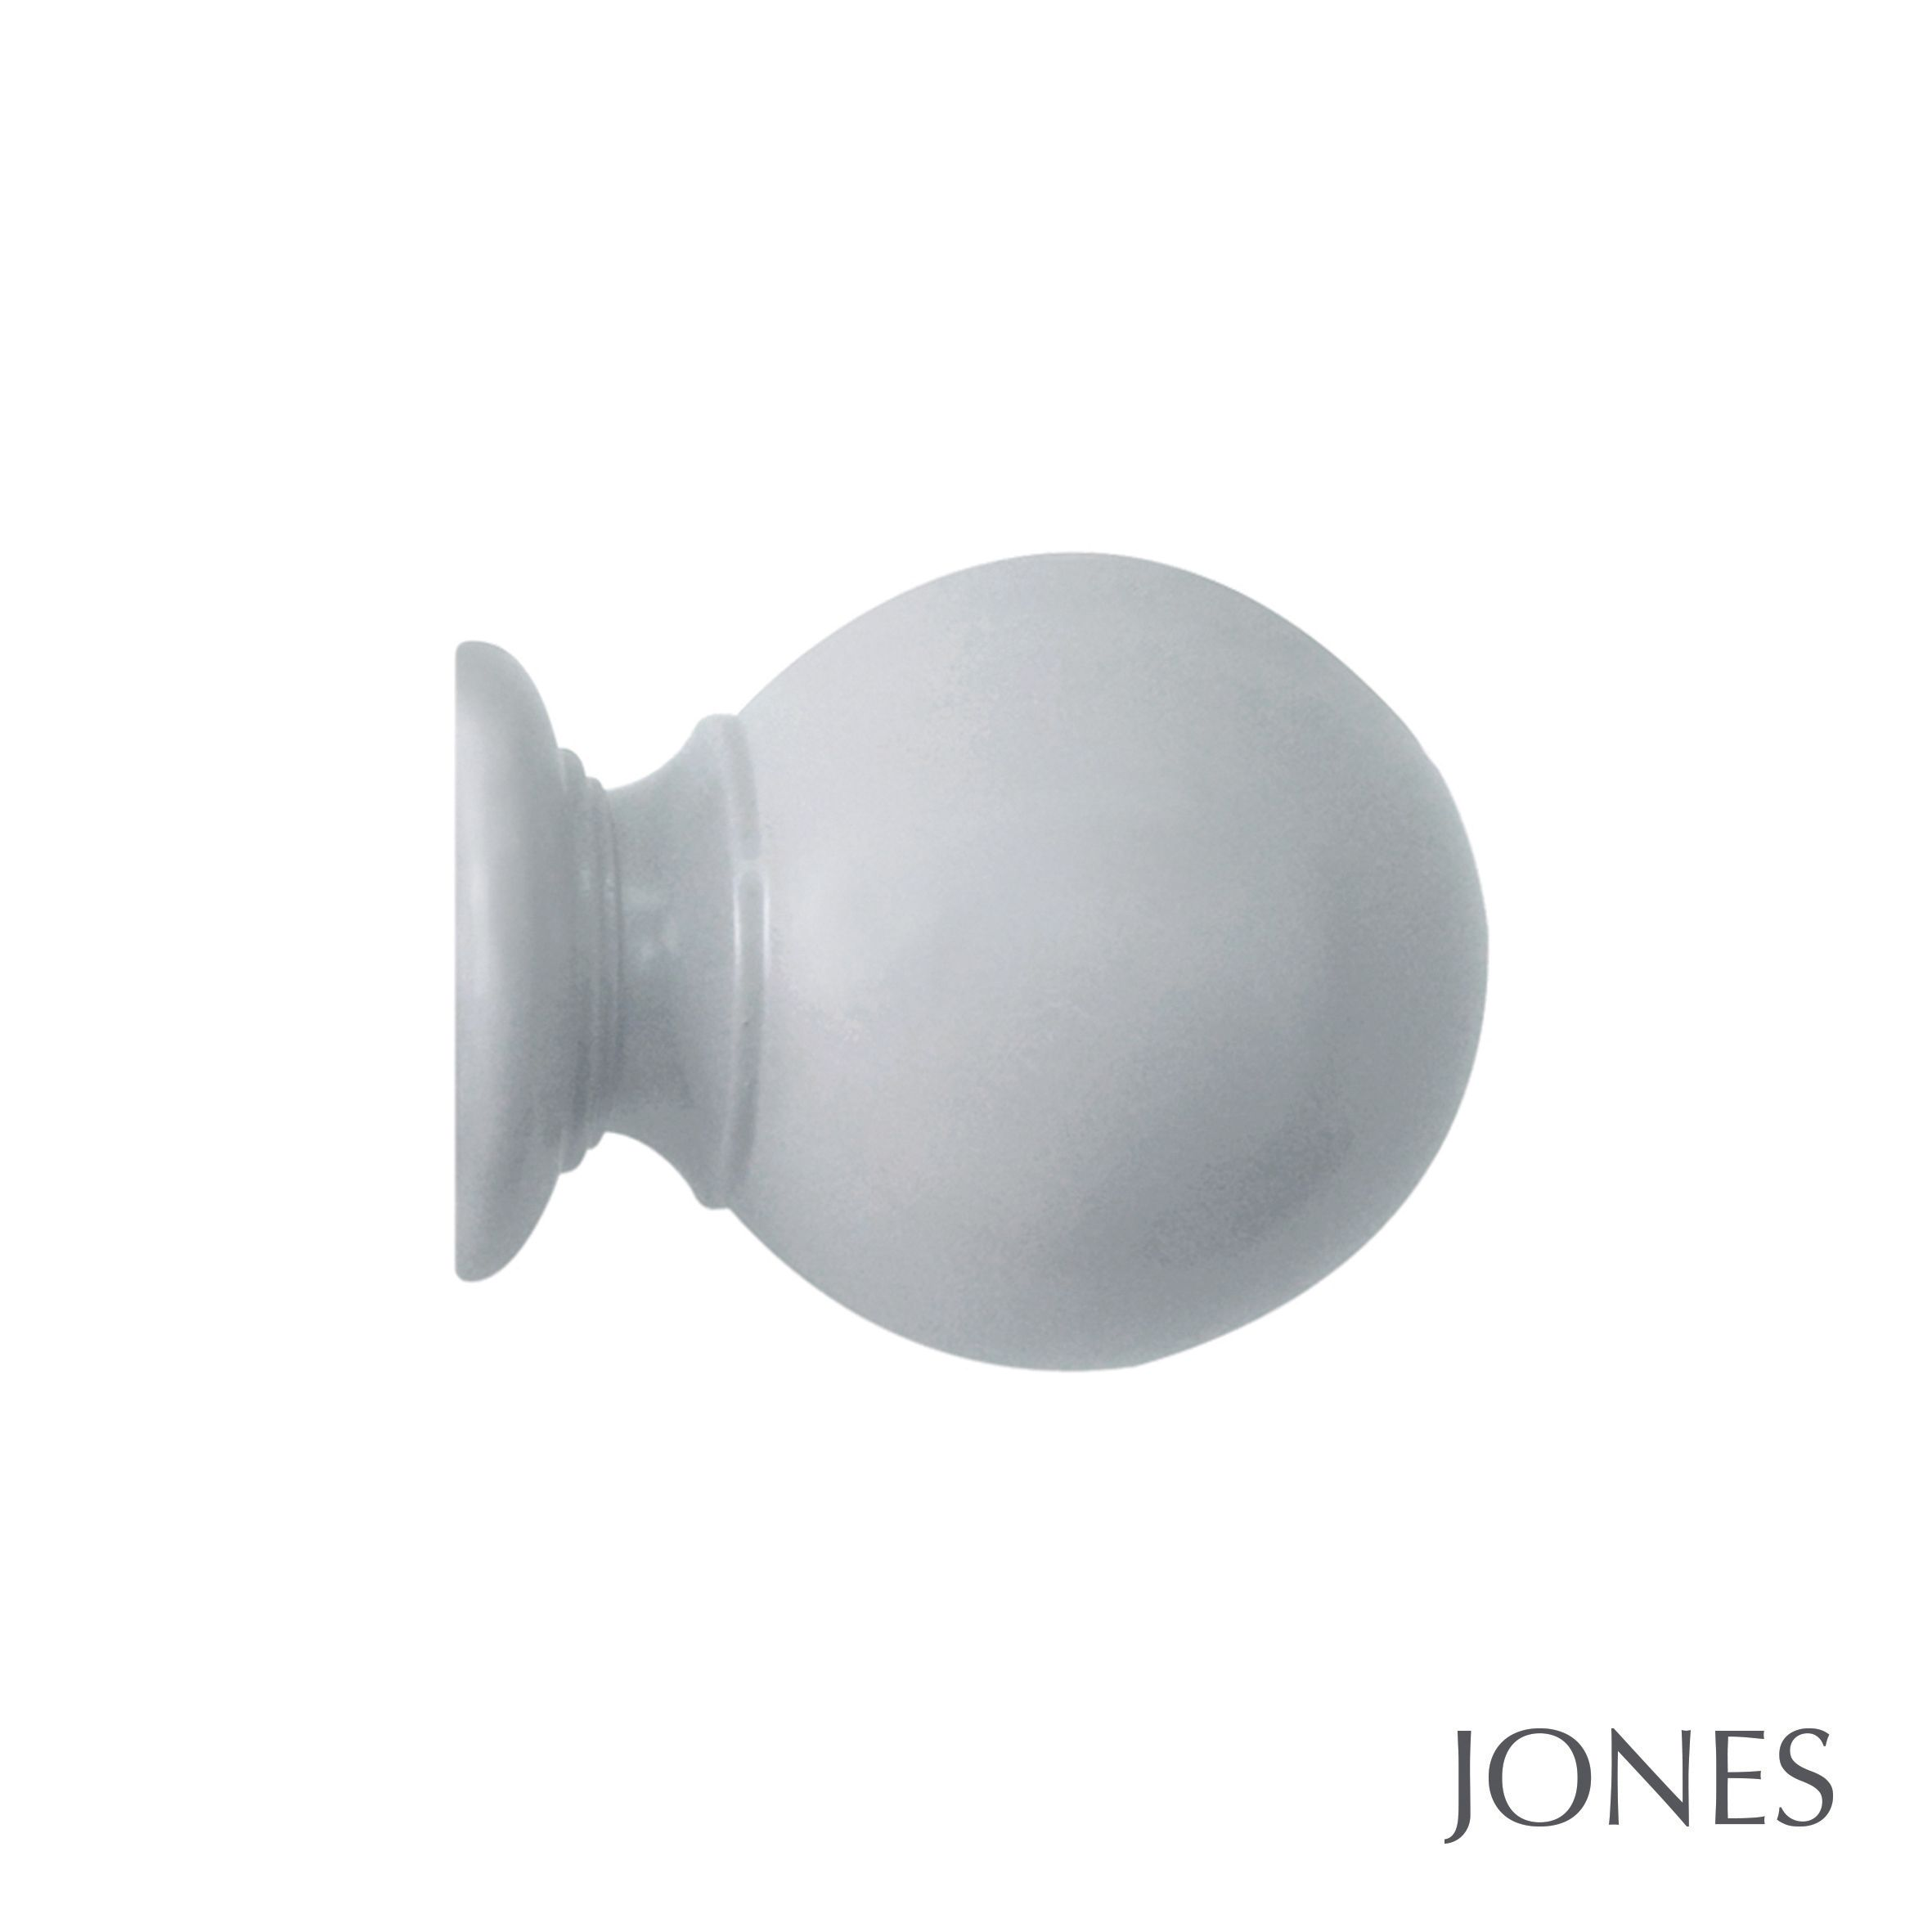 50mm Jones Estate Ball Finial shingle